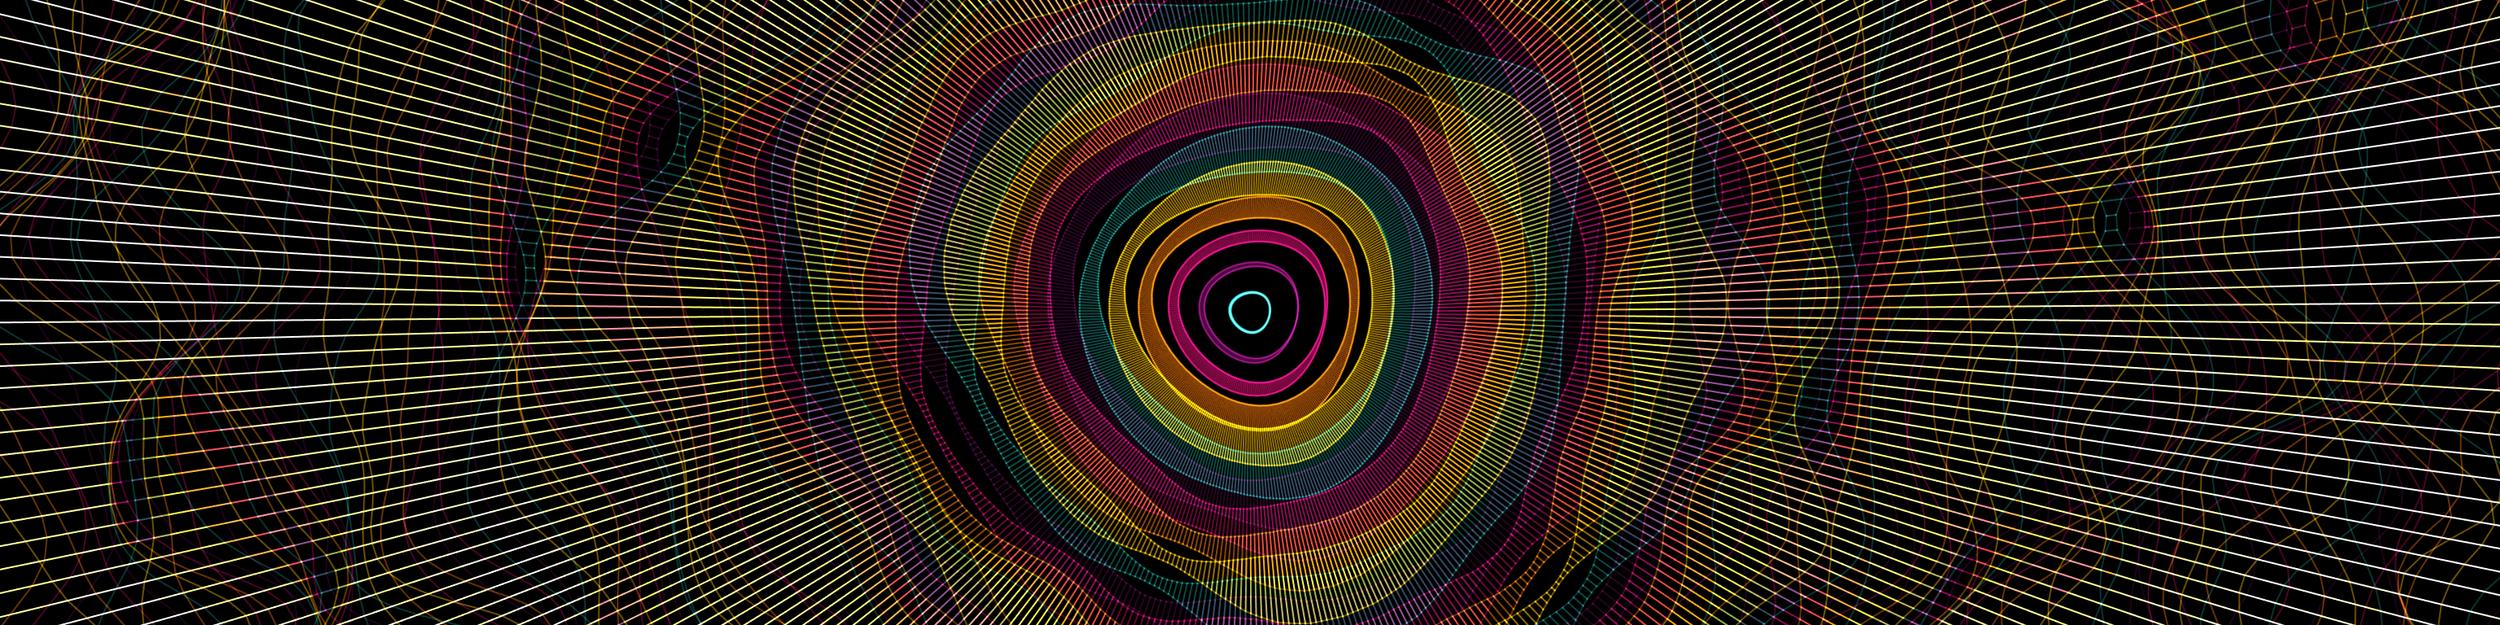 NoiseFormLayer 2014-09-11-17-06-08-933.png